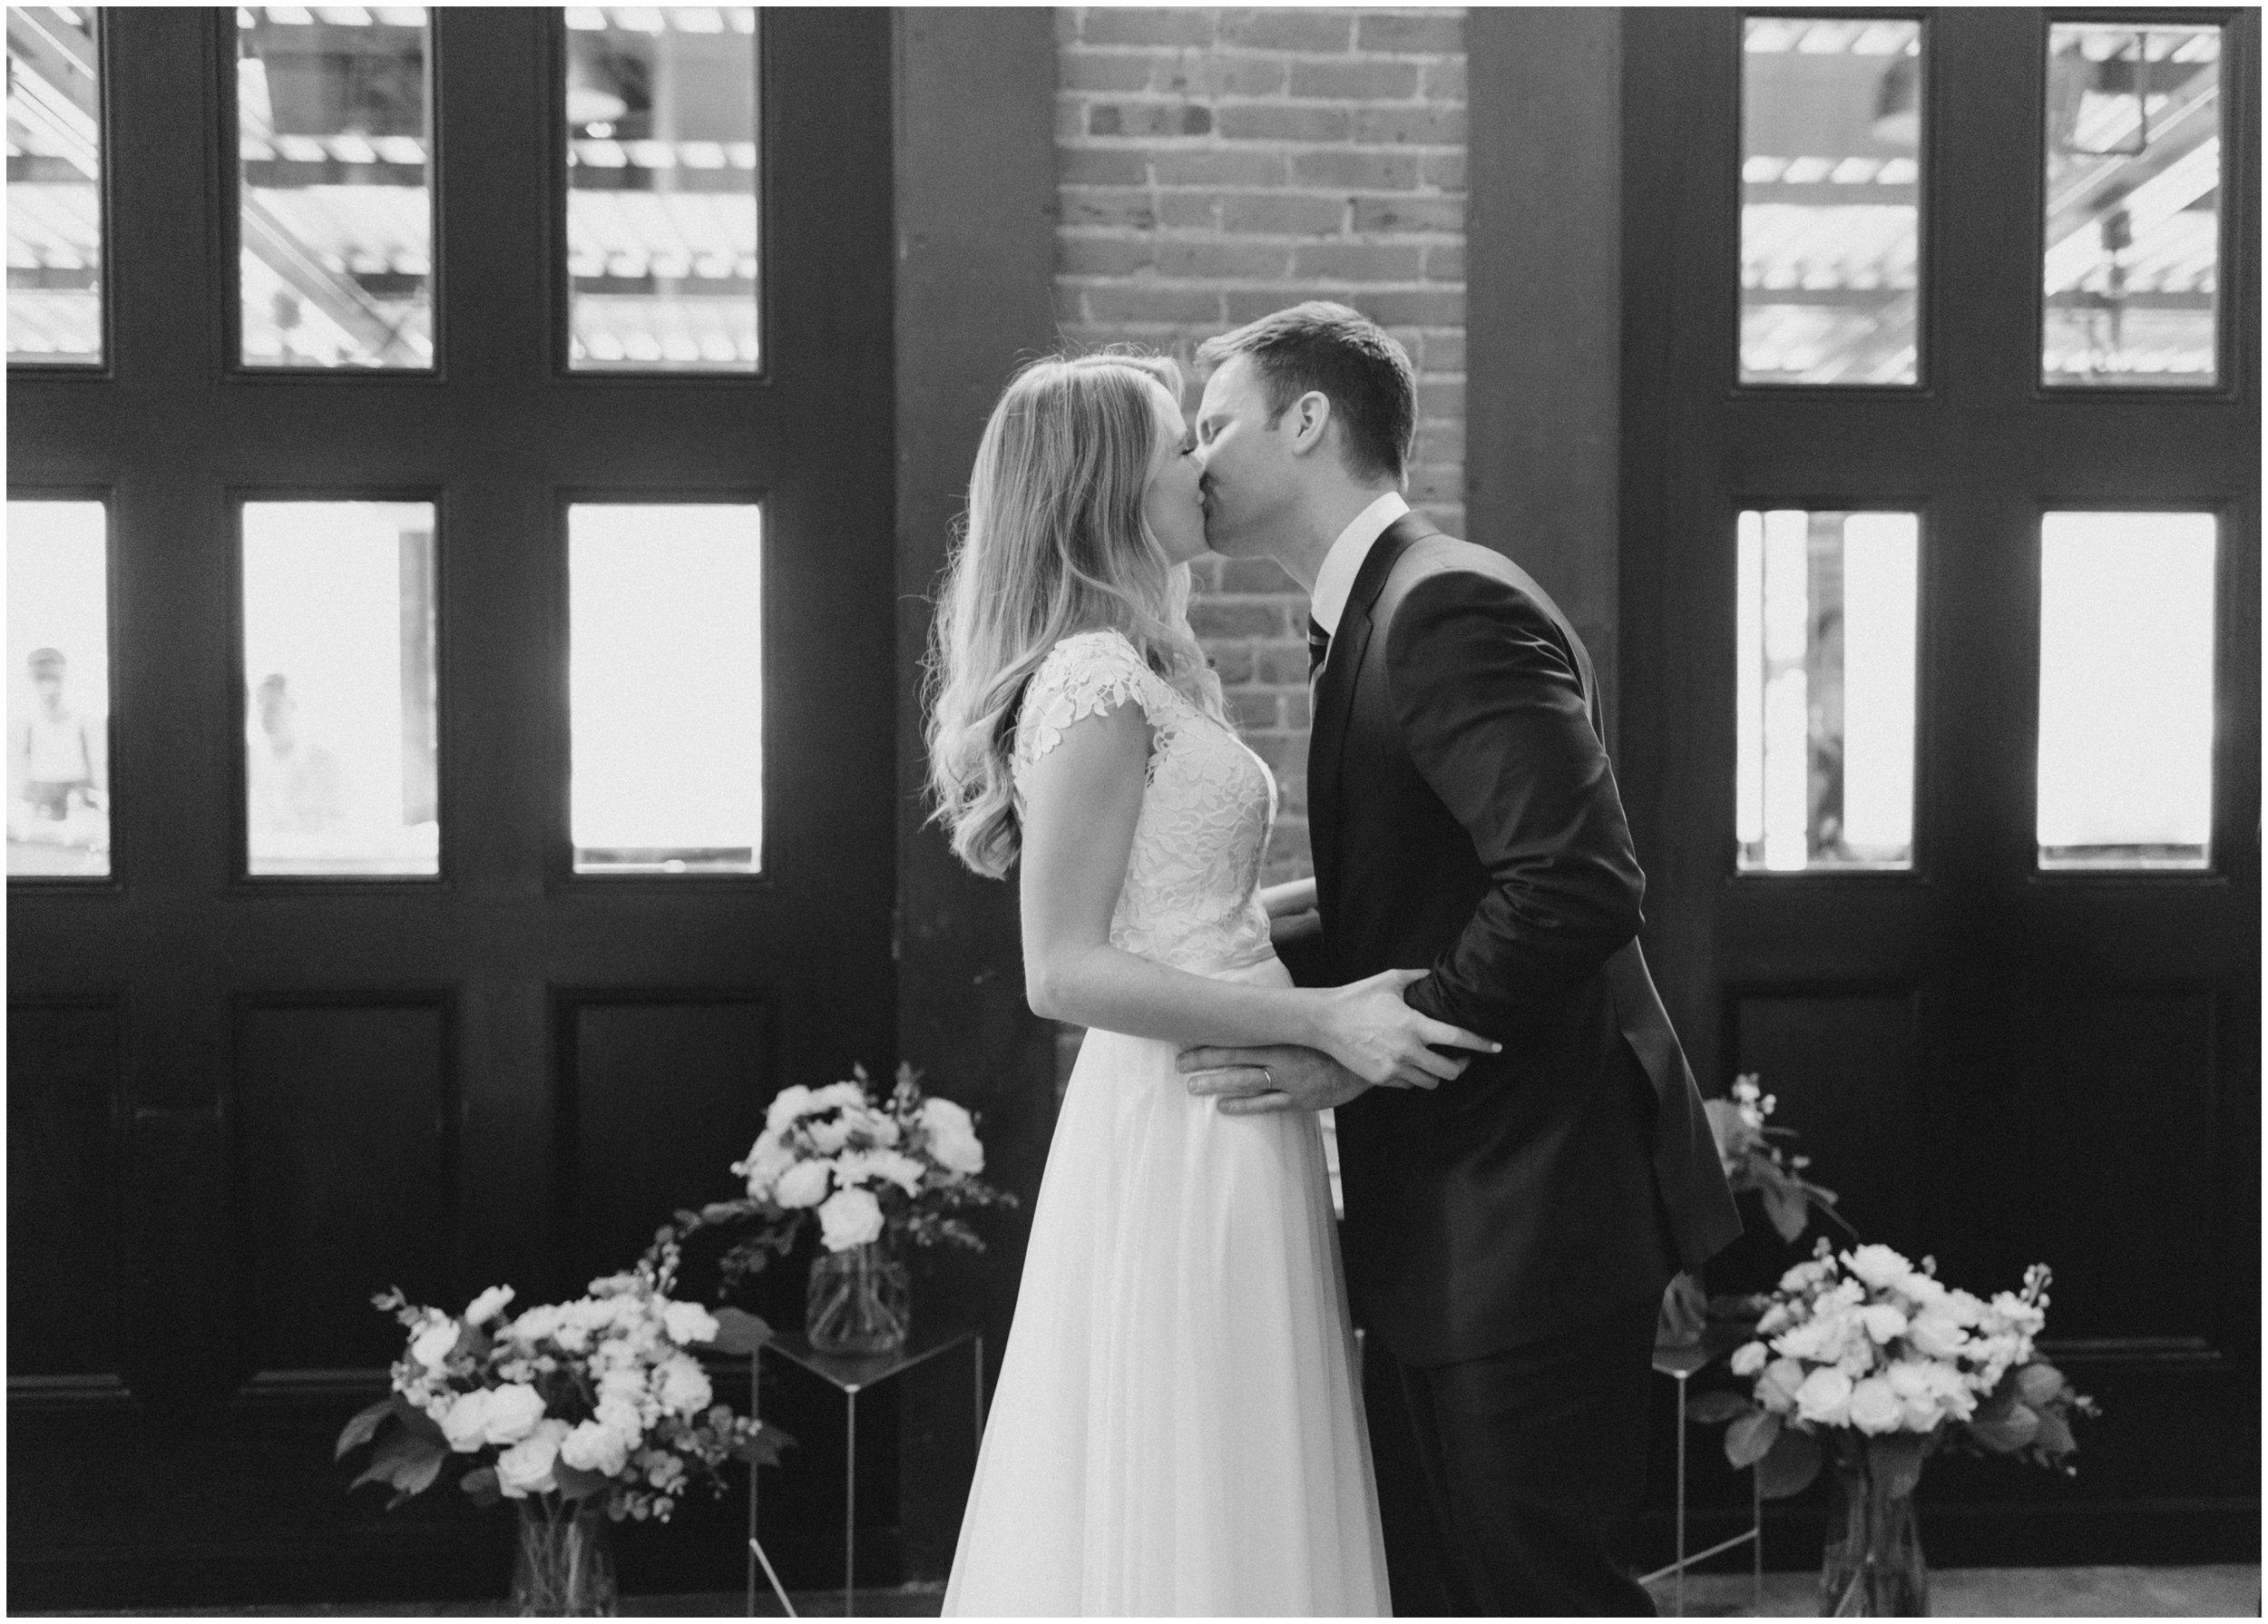 jay-robin-married-row-34-boston-33.jpg